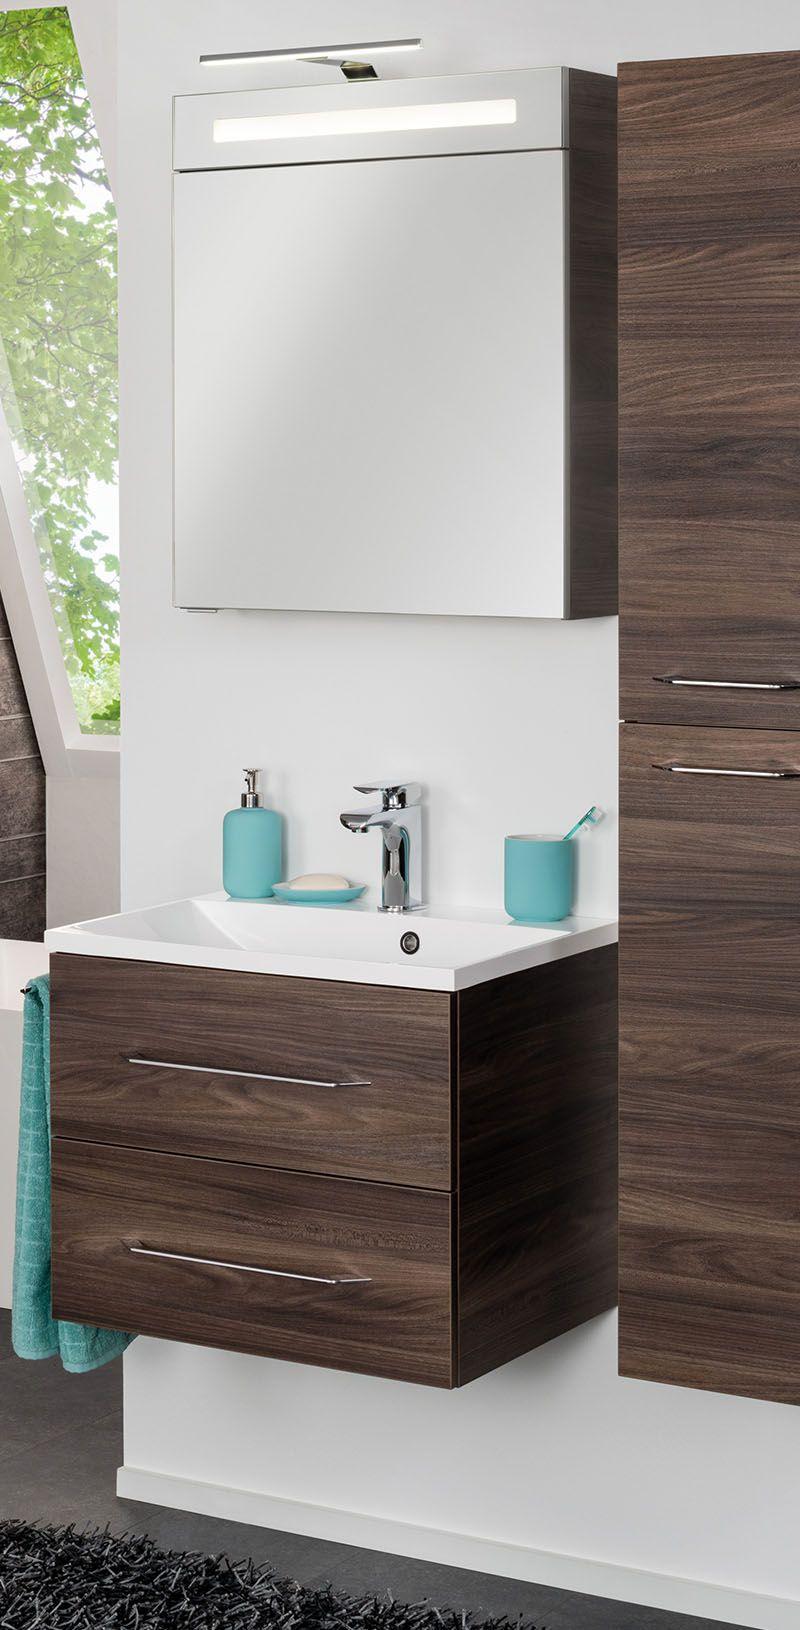 20 Badezimmer Ideen   badezimmerausstattung, badezimmer, baden